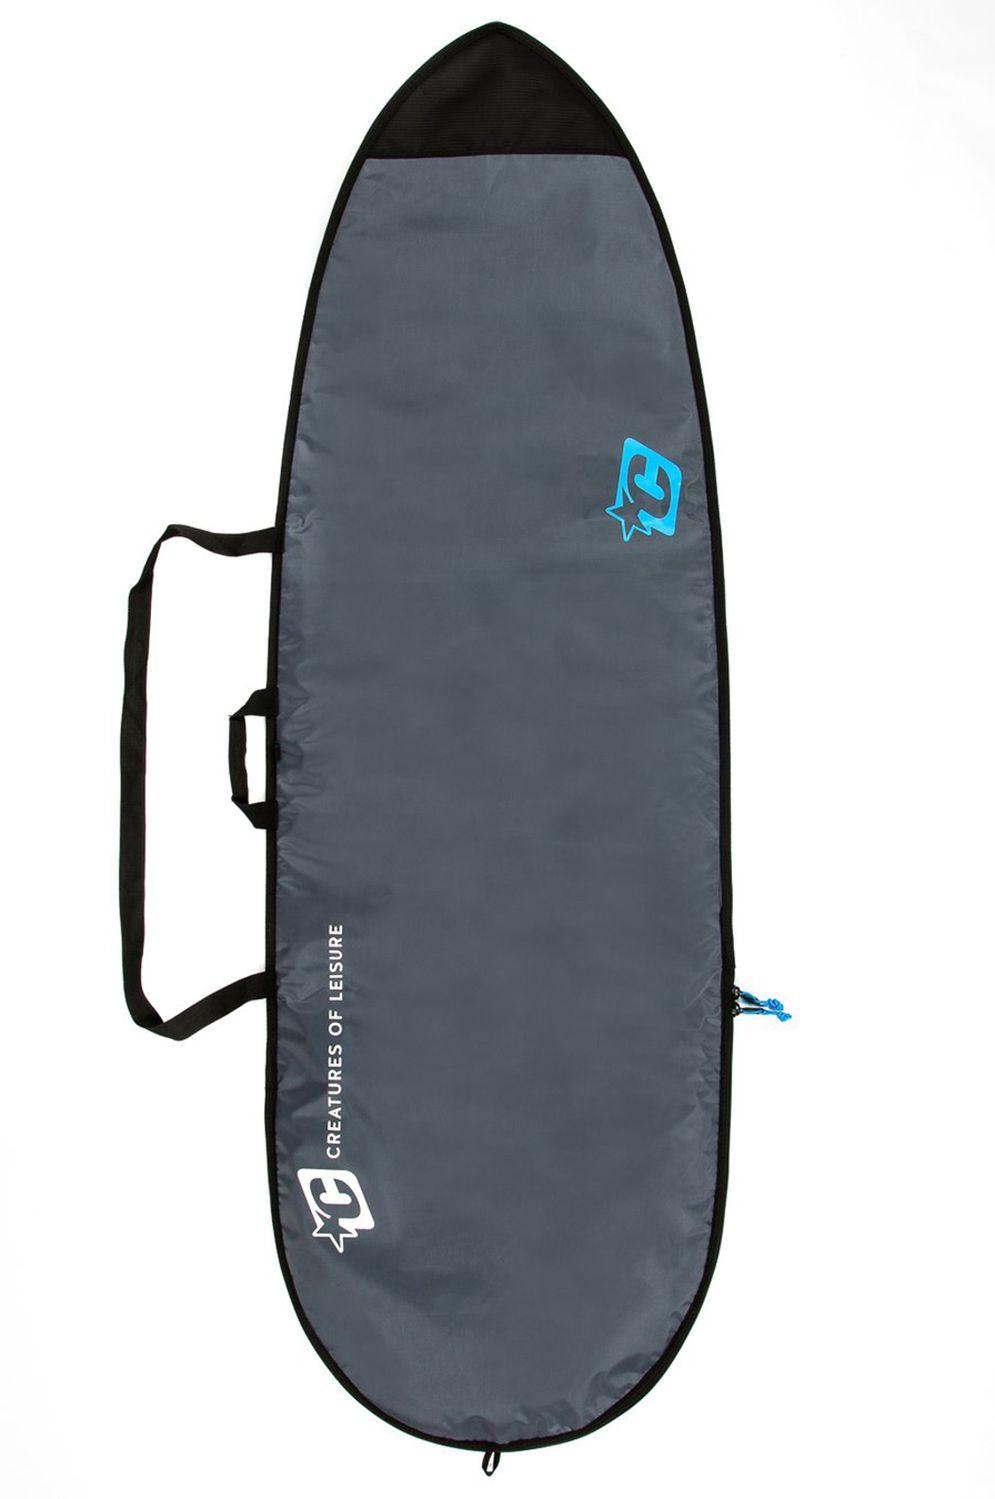 Creatures Boardbag 6'3 FISH LITE Charcoal Cyan